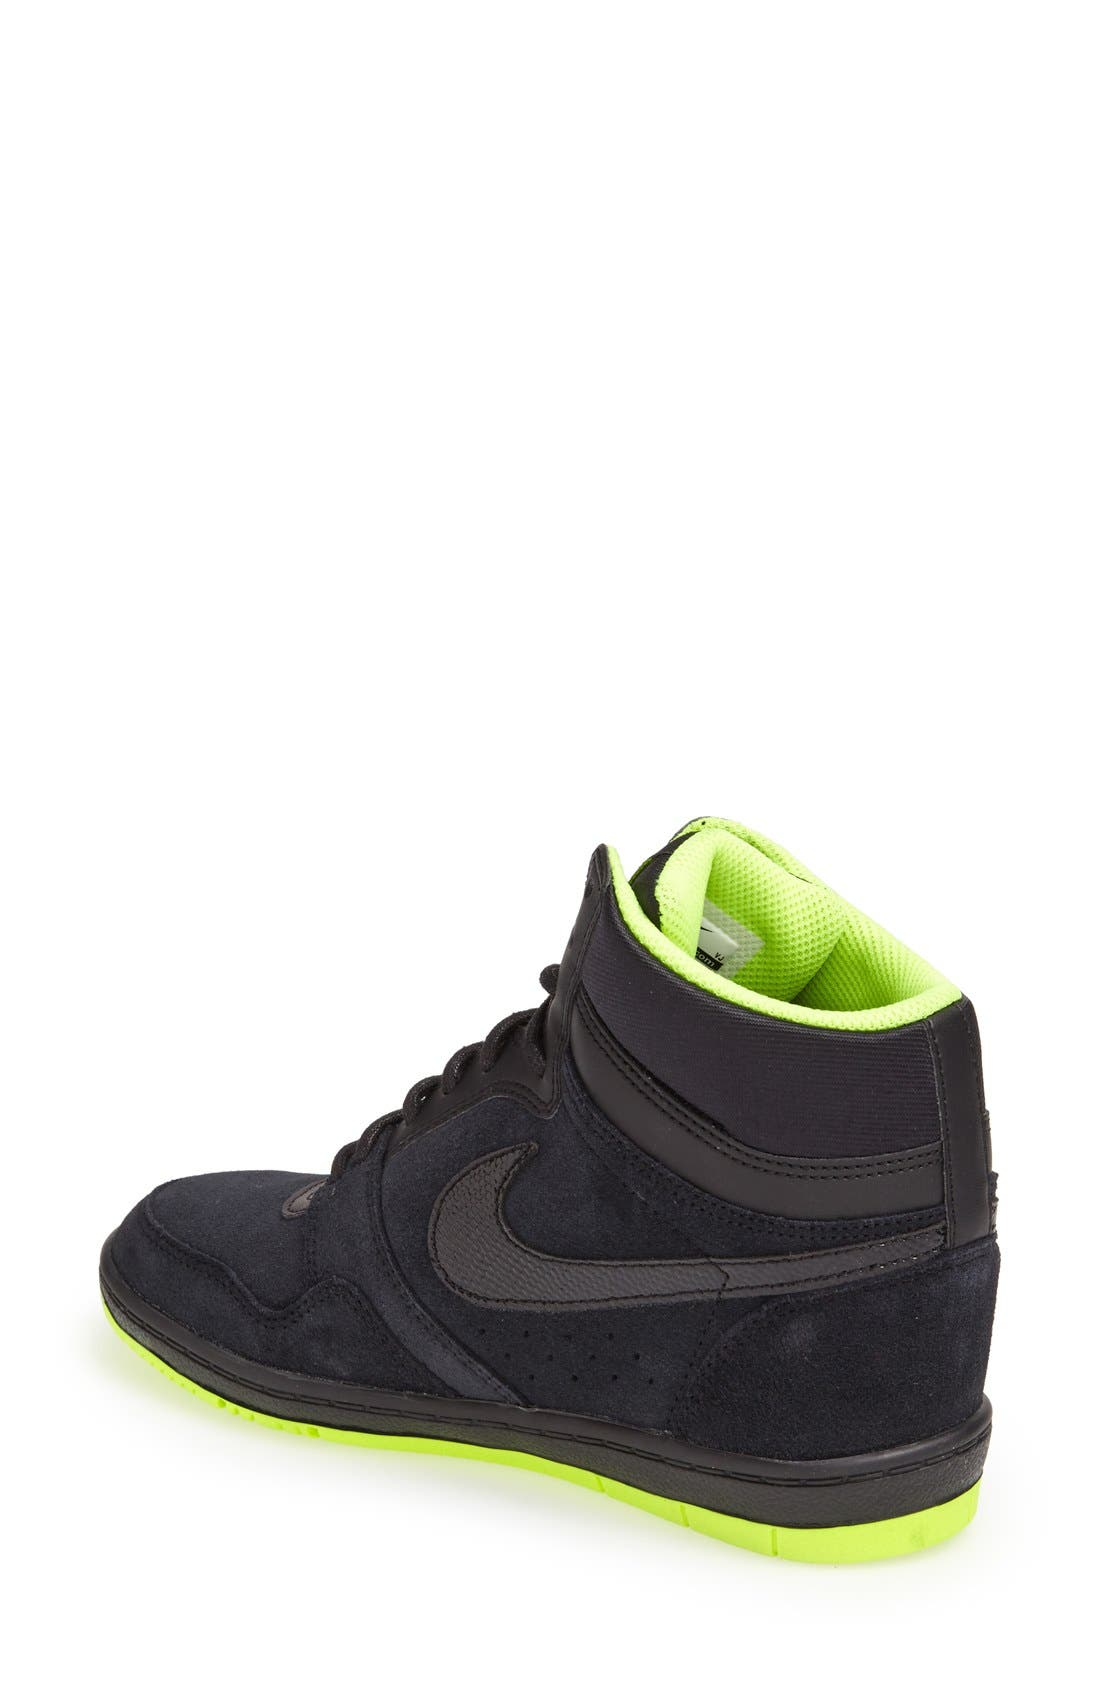 Alternate Image 2  - Nike 'Force Sky High' Sneaker (Women)